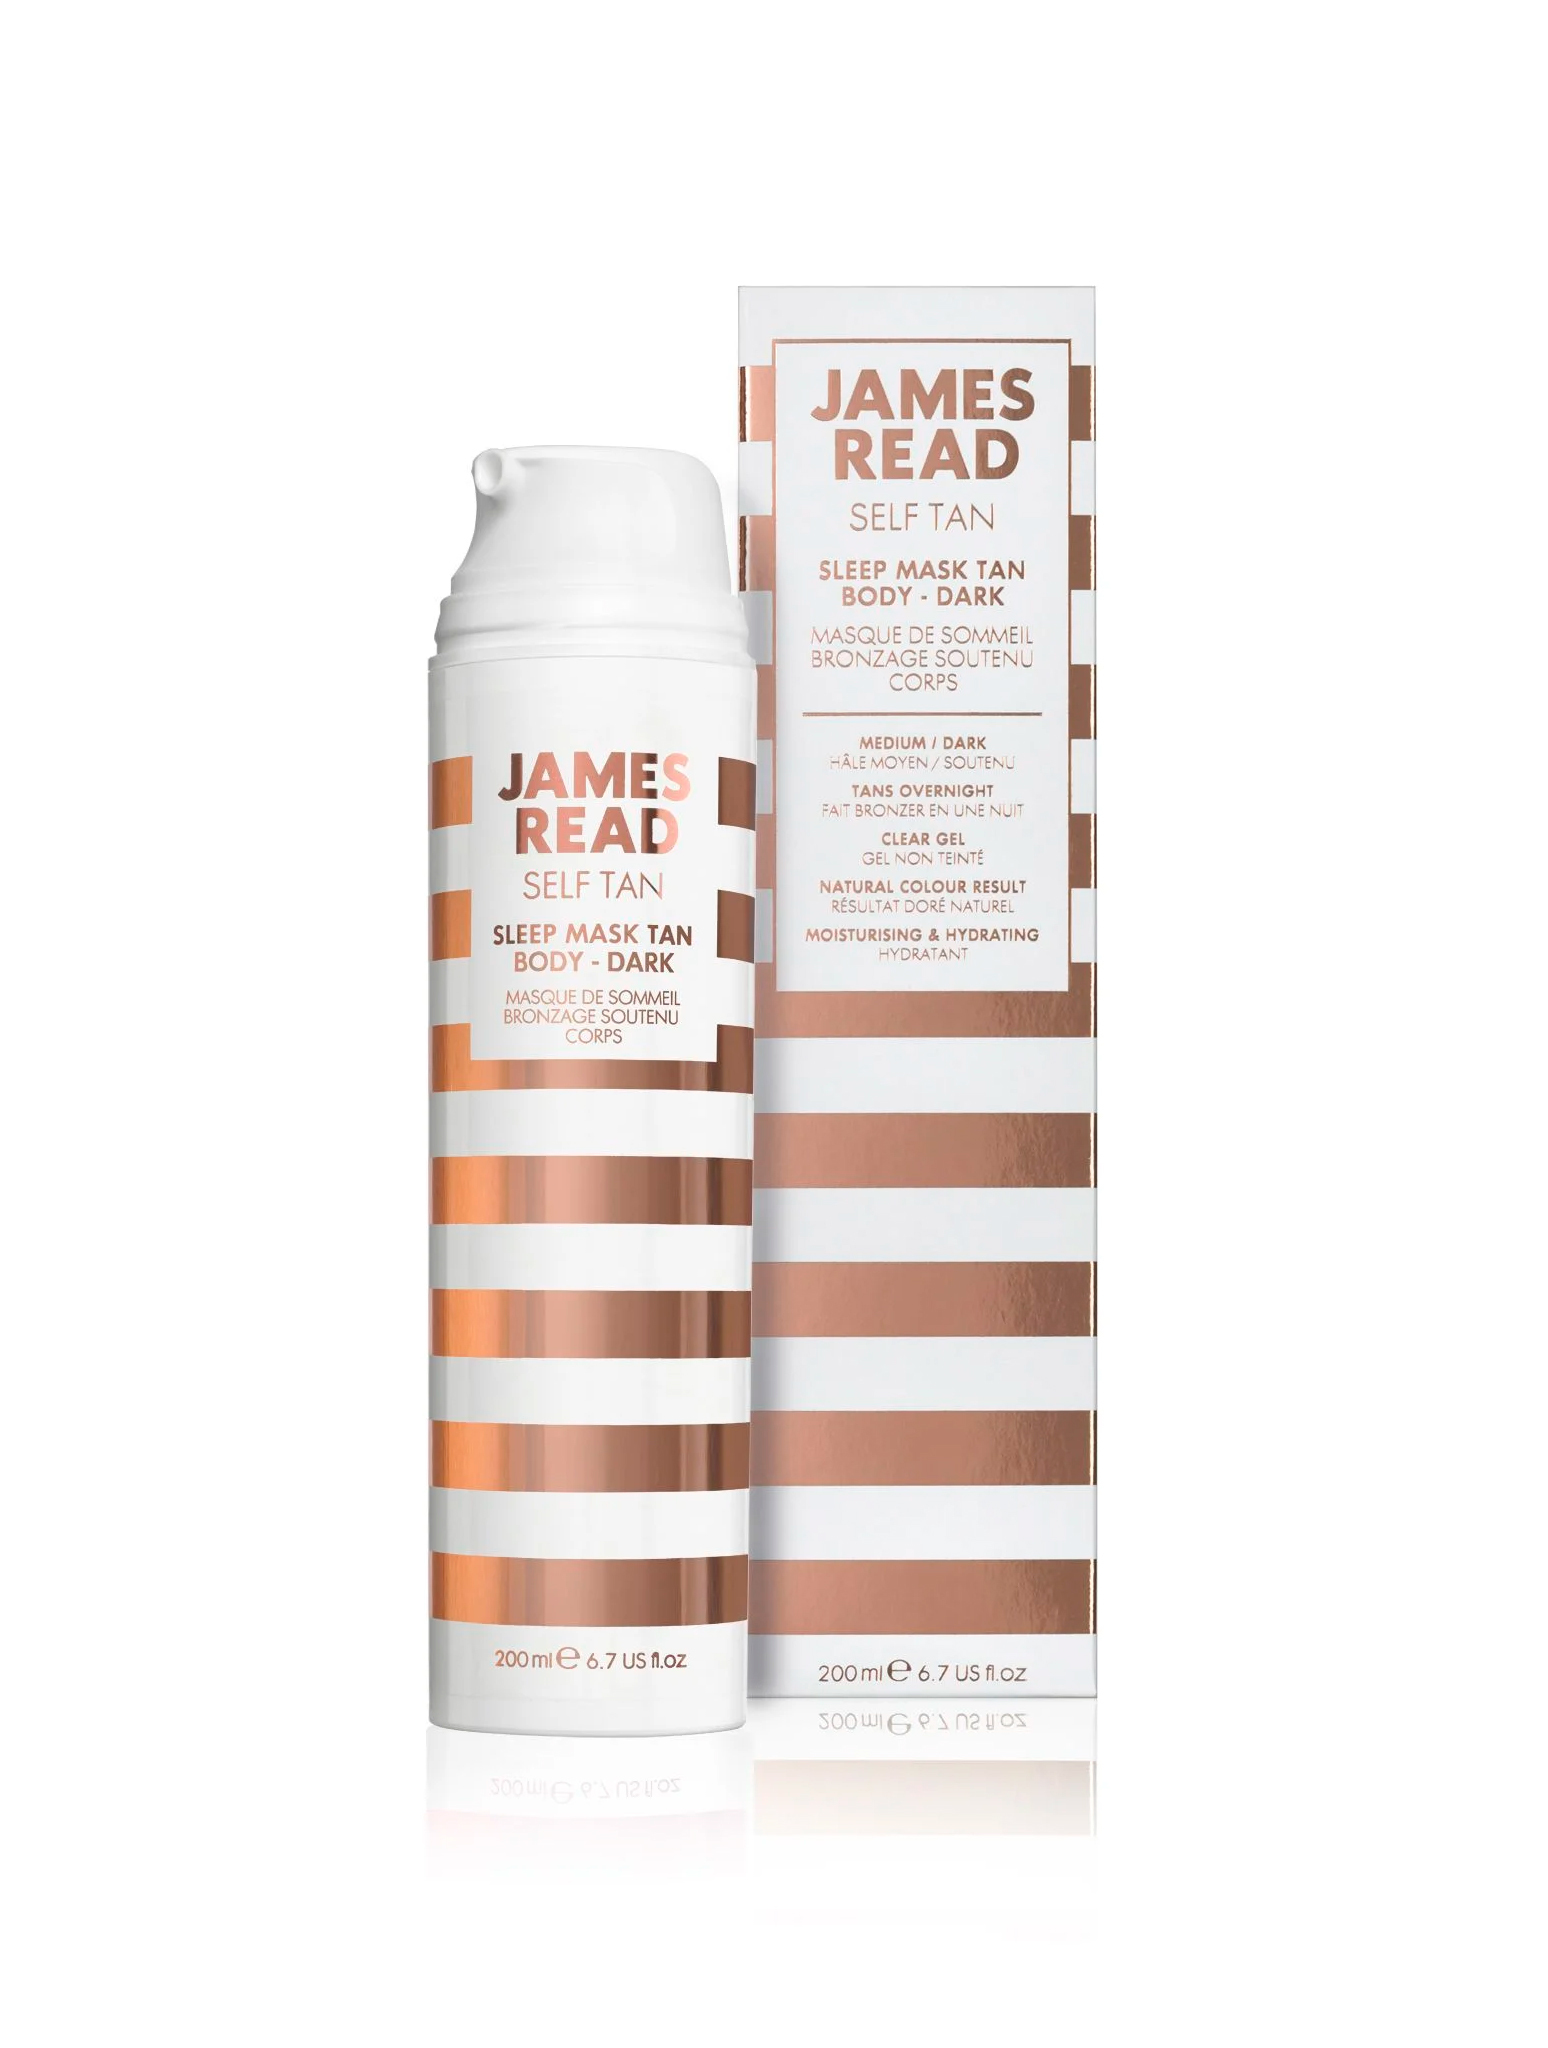 Маска ночная для тела уход и загар James Read Self Tan Sleep Mask Tan Body - Dark 200 мл